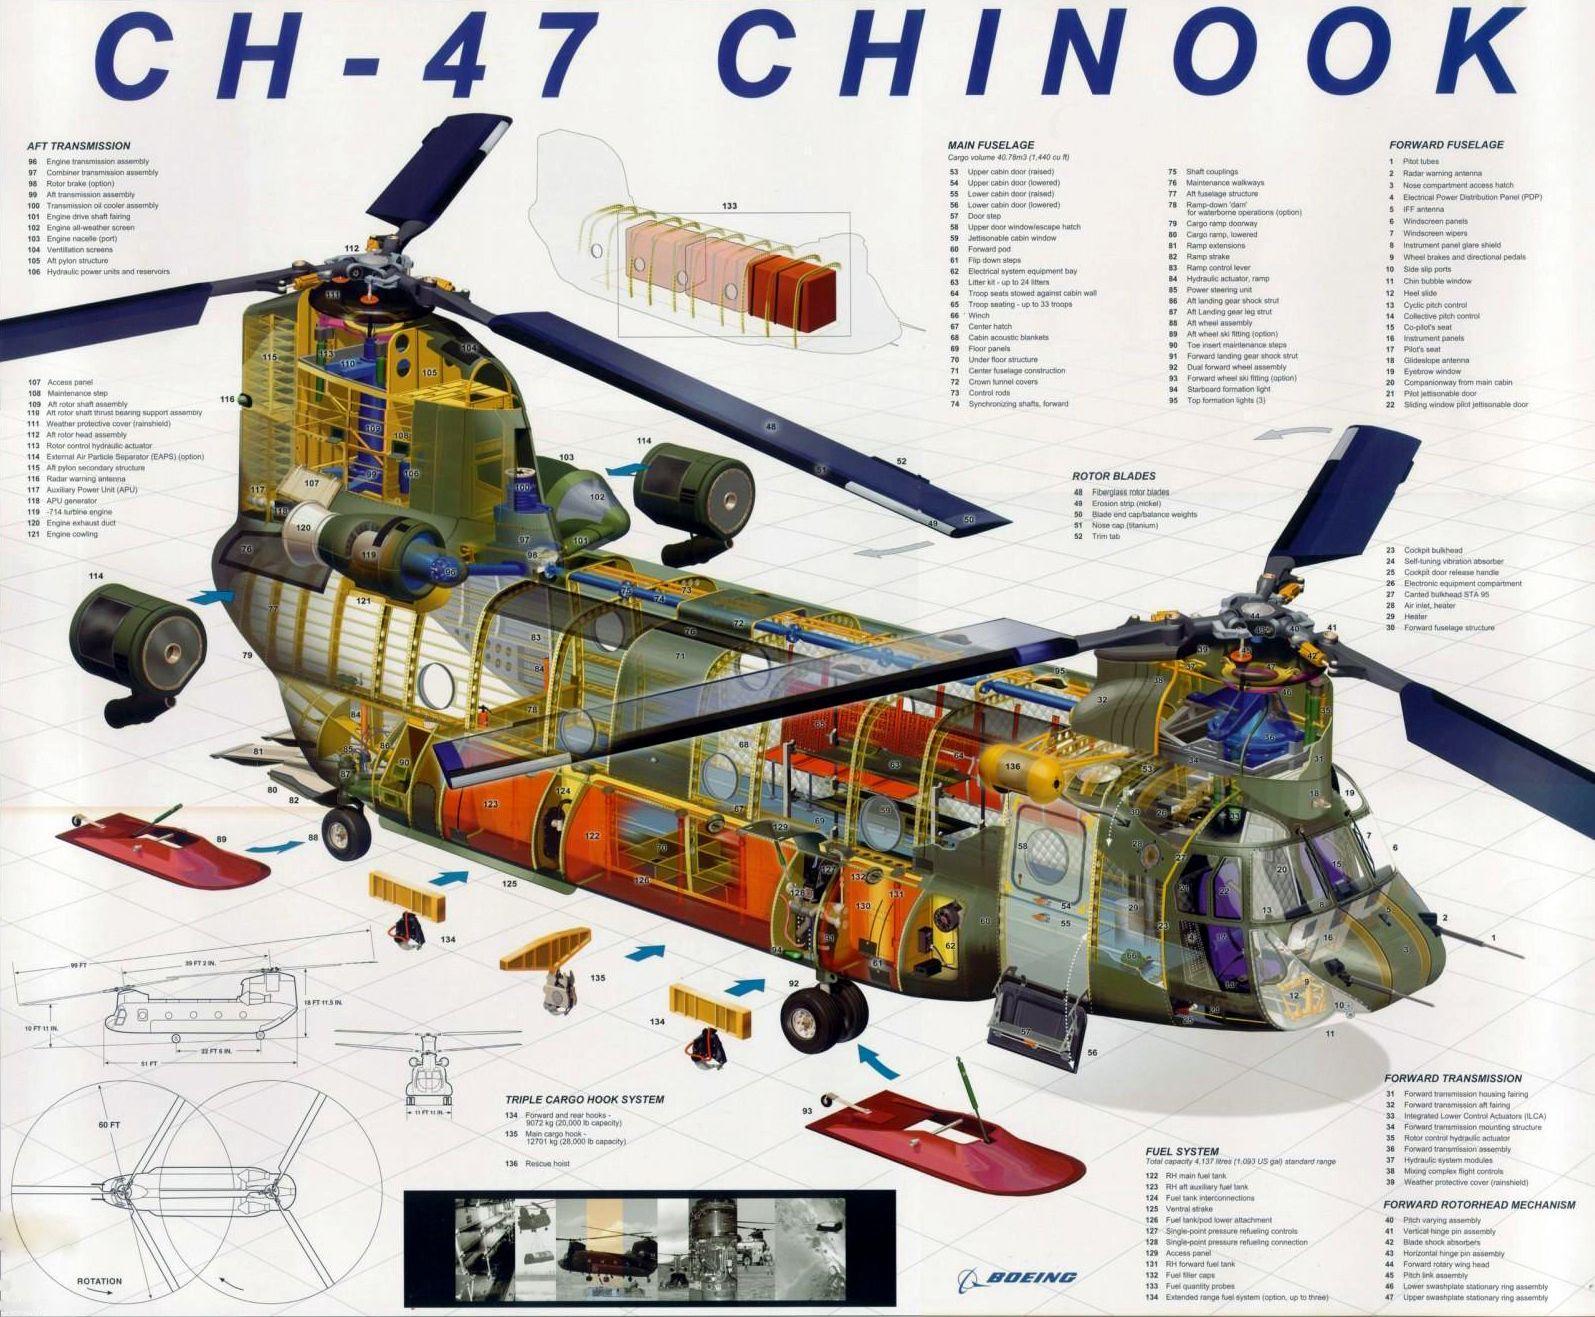 medium resolution of ch 47 chinook cutaway by boeing